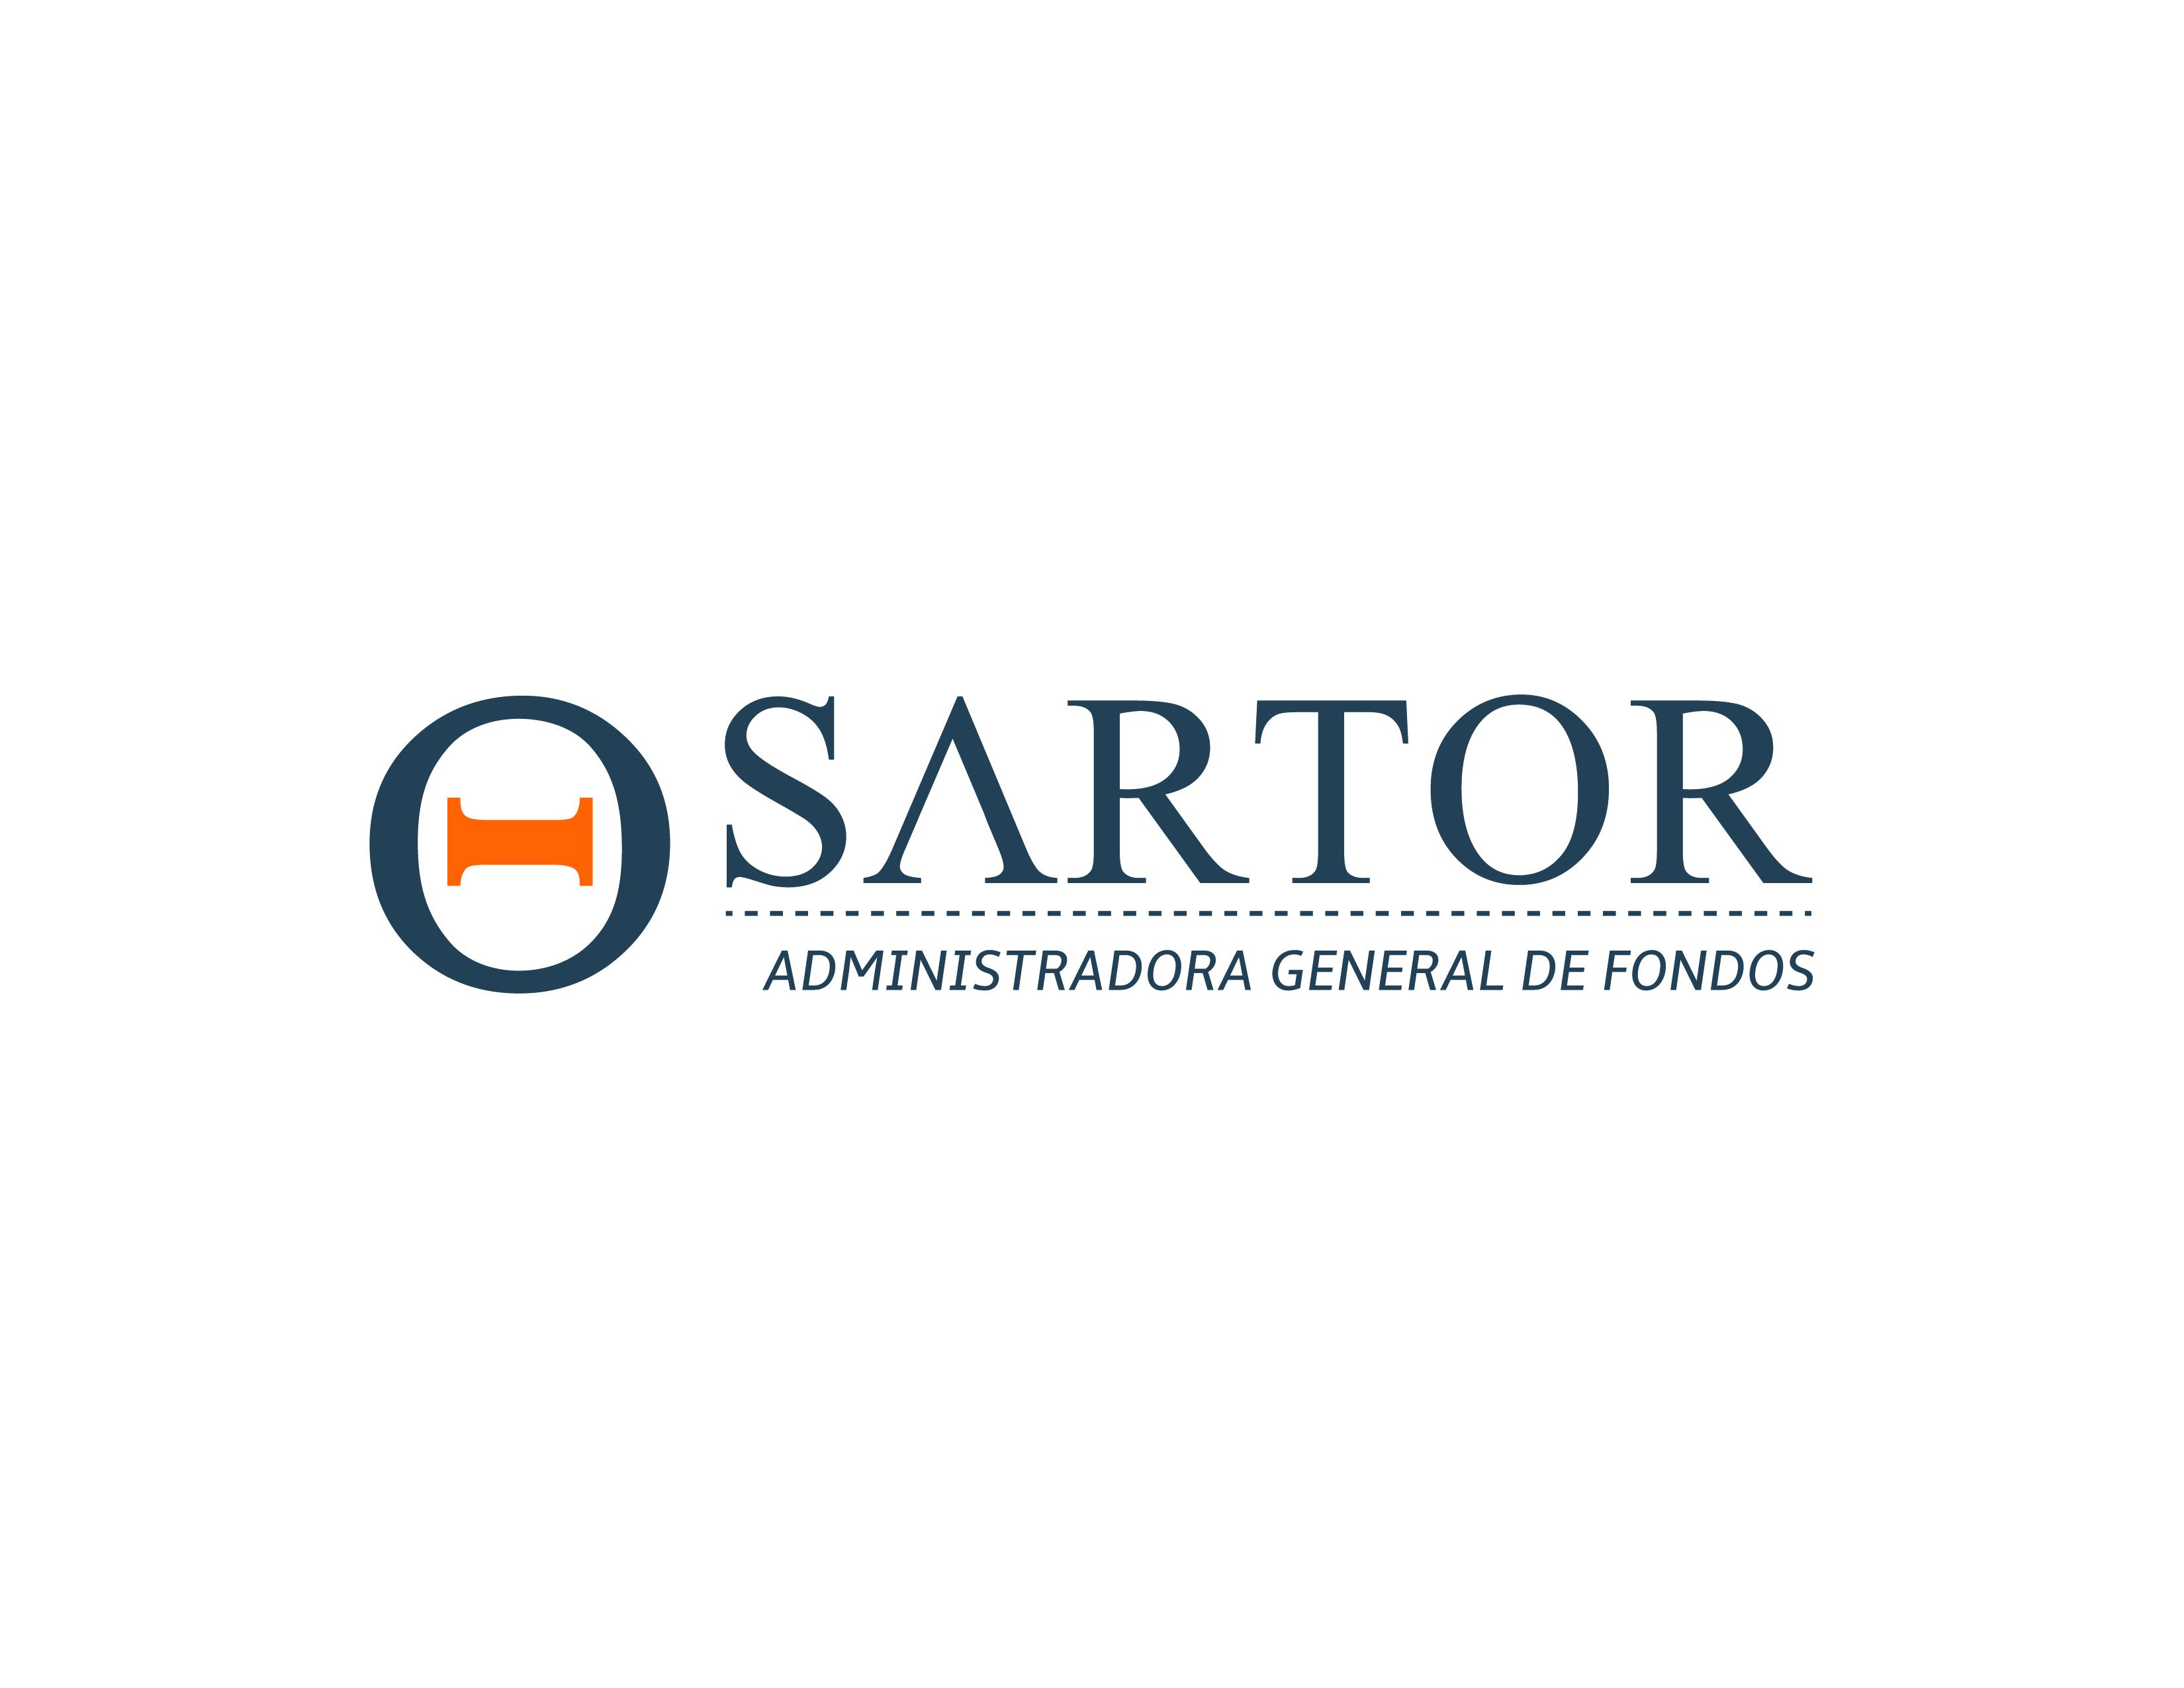 Empresas Desafio10x: Sartor Administradora General de Fondos S.A.